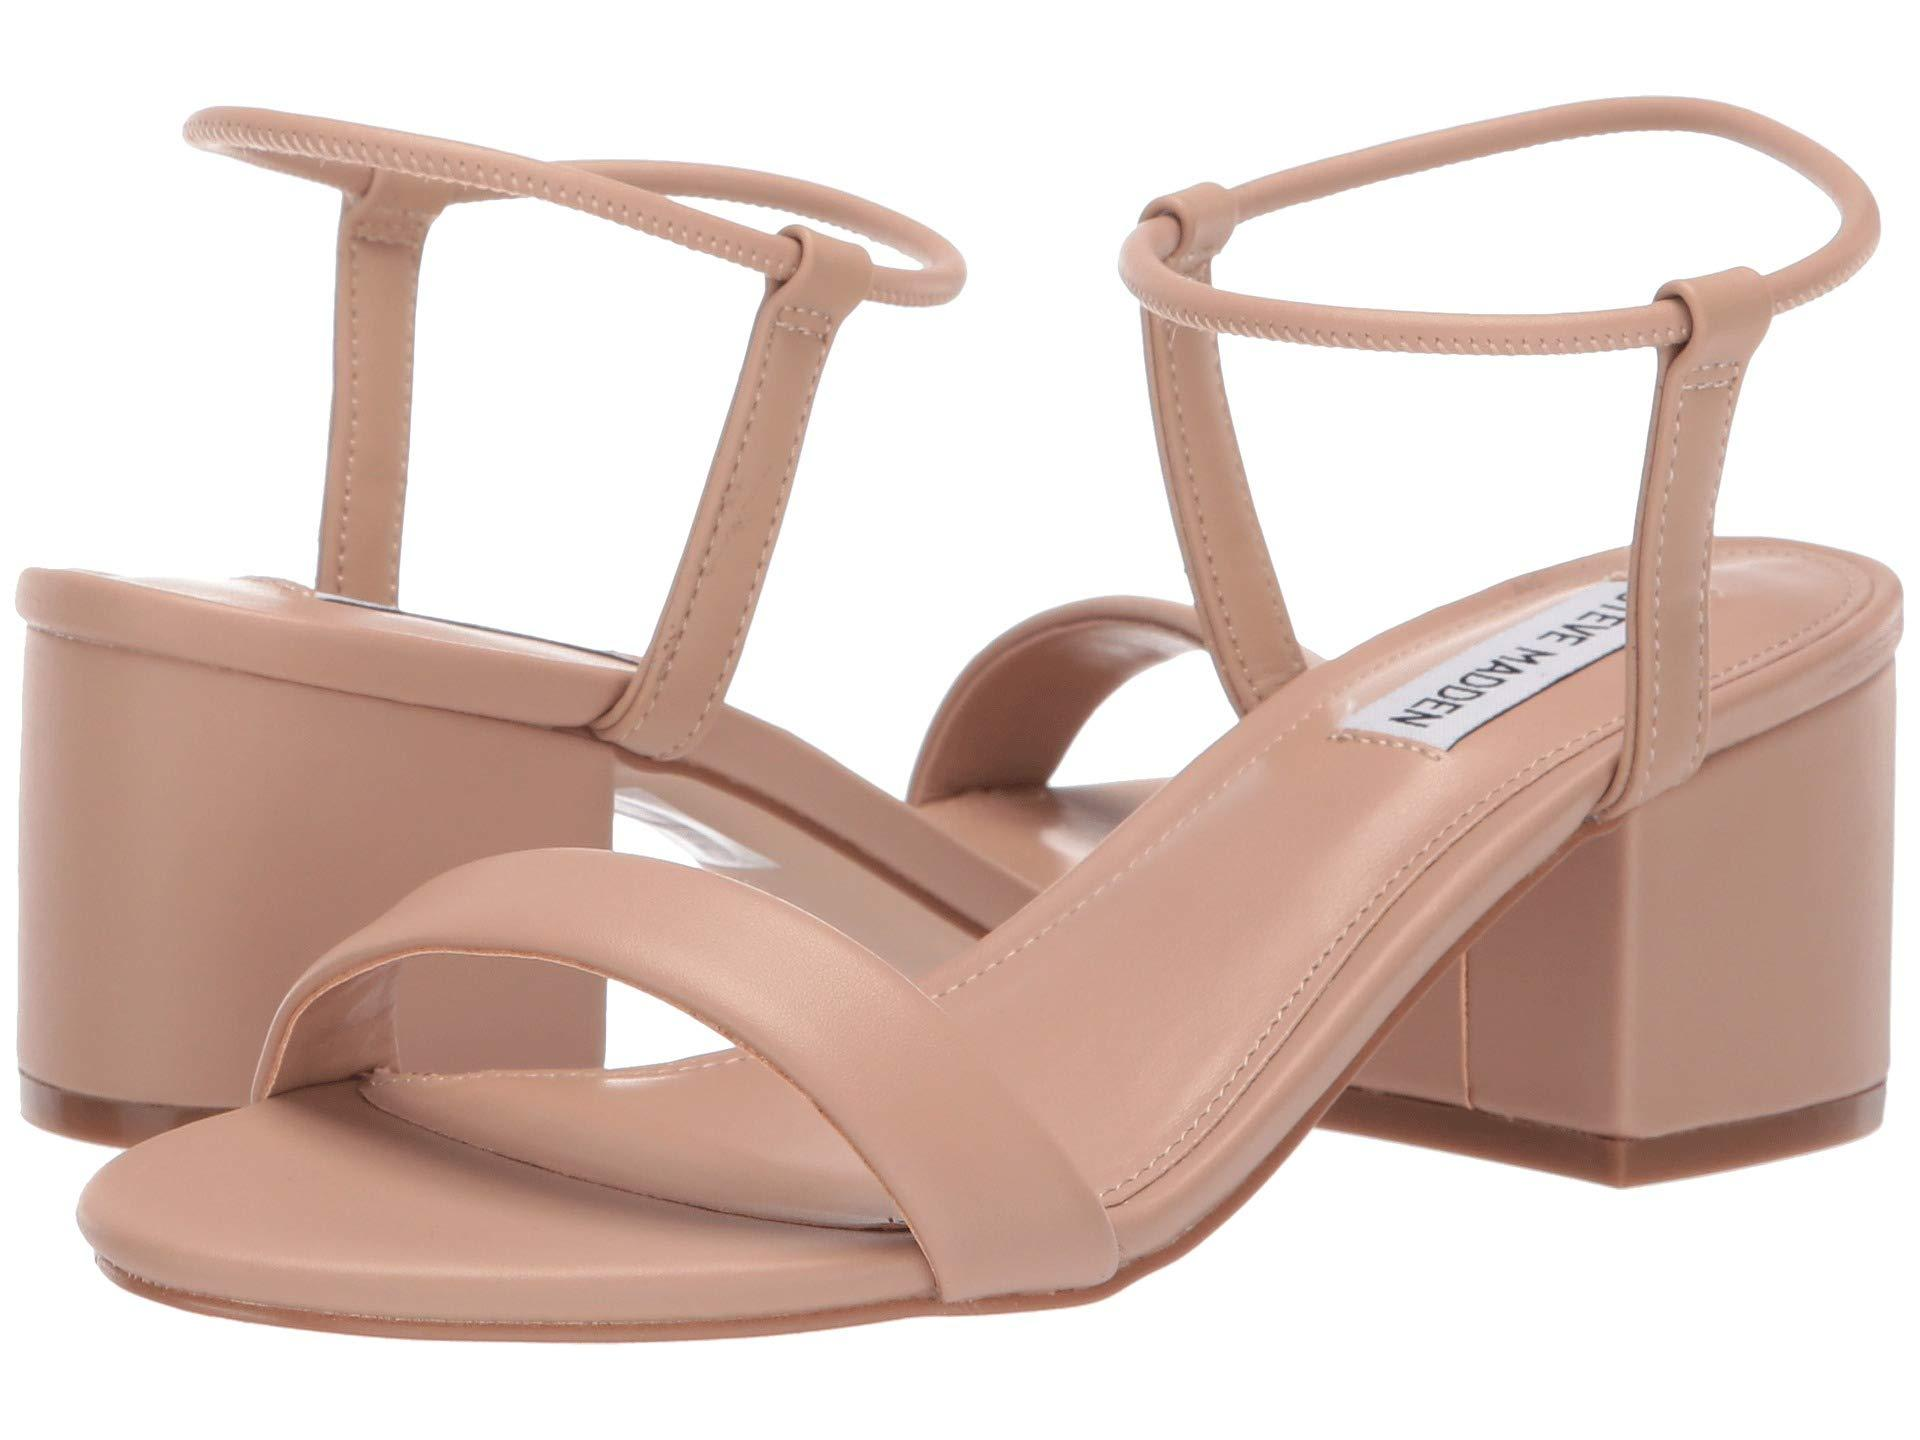 eb5054884ec Lyst - Steve Madden Ida Heeled Sandal in Natural